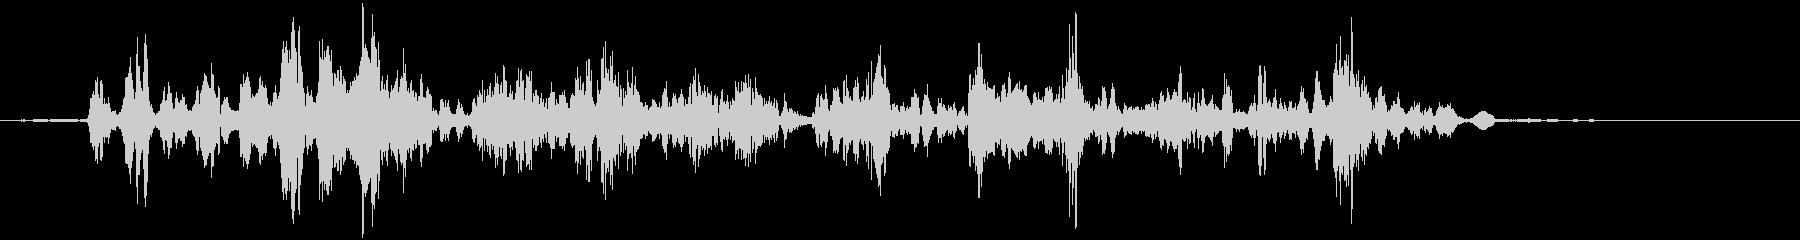 KANT 鳥のロボット声効果音4の未再生の波形